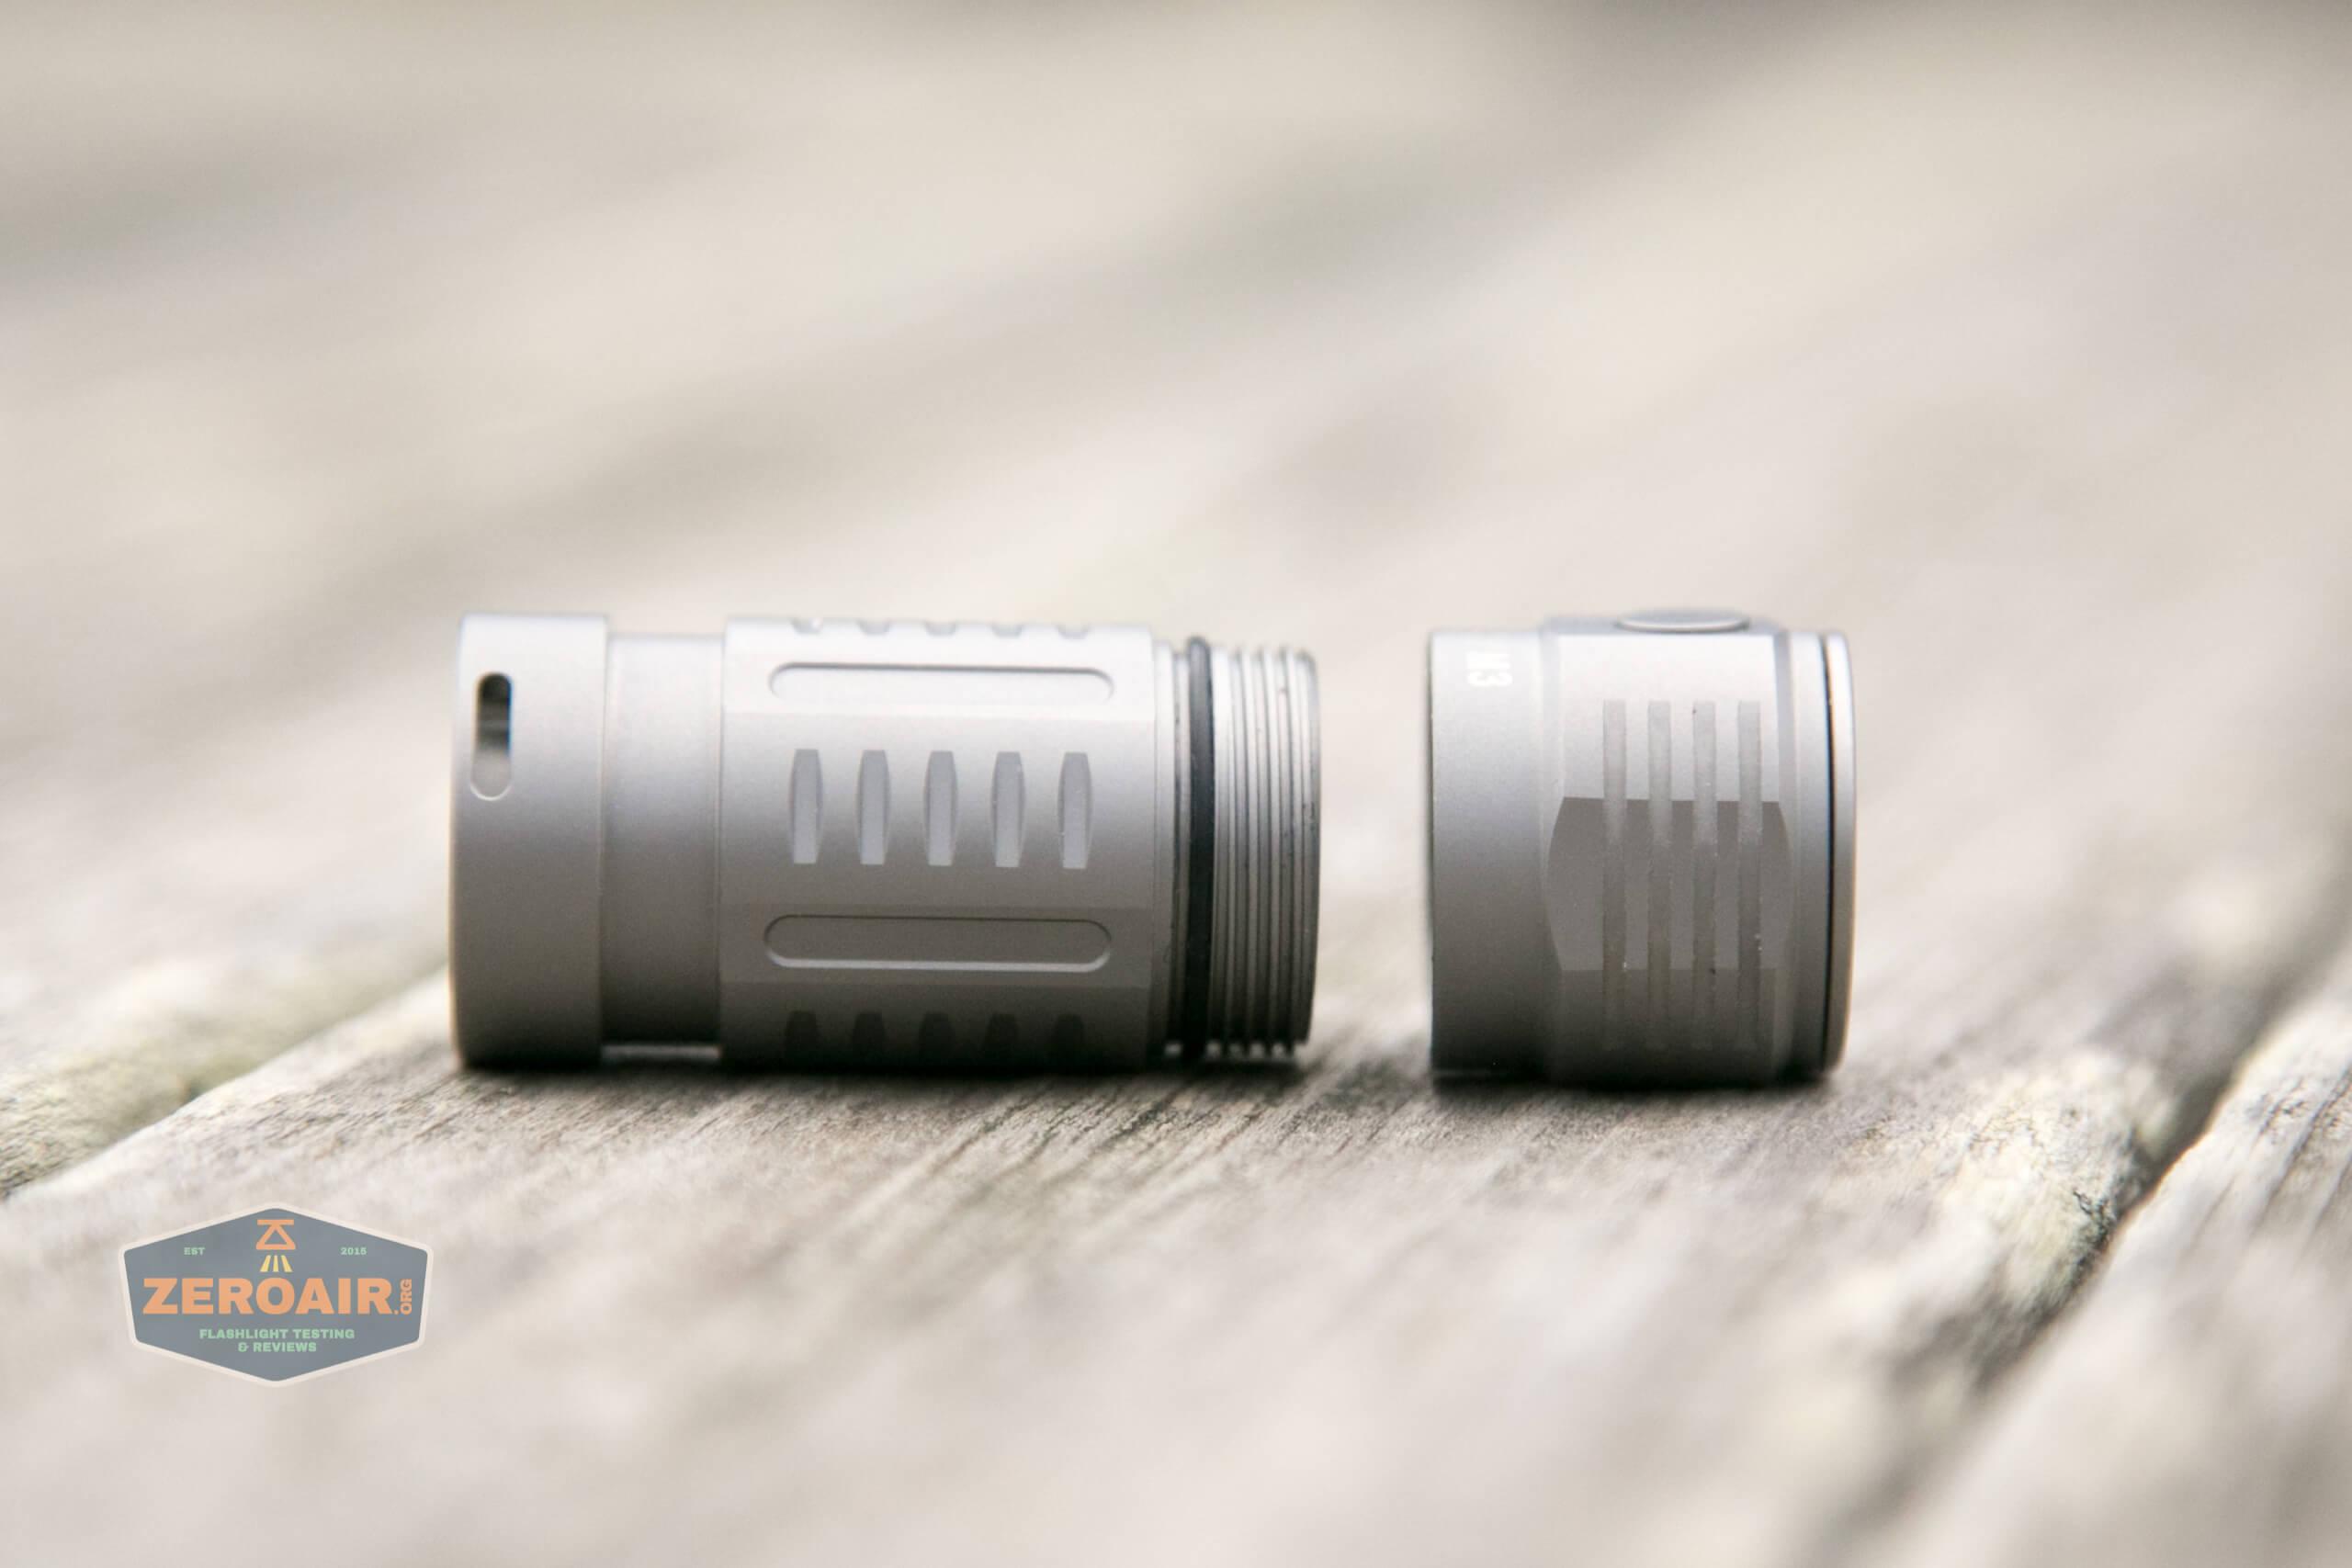 freasygears cyansky m3 titanium pocket flashlight head removed